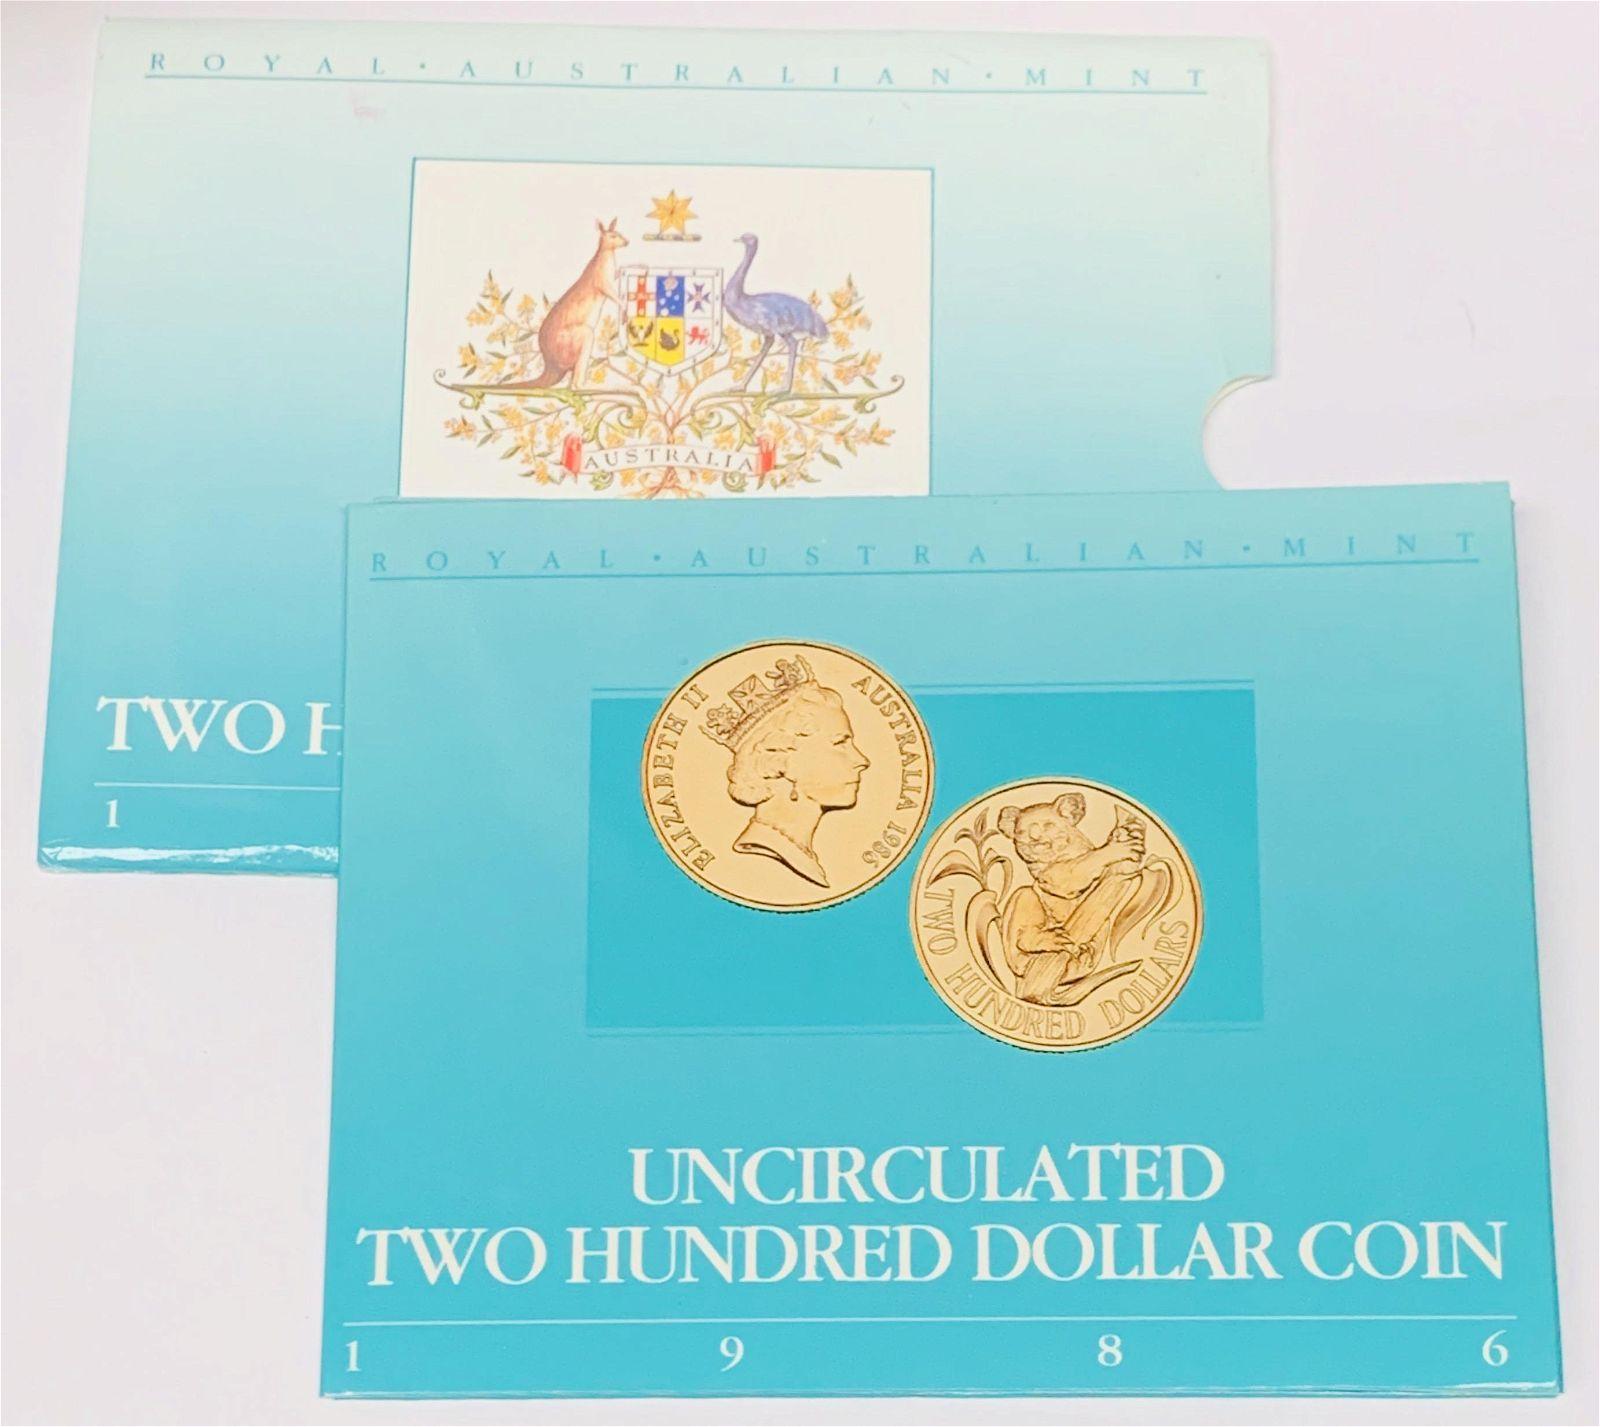 1986 Australia Koala $200 Gold Uncirculated Coin Royal